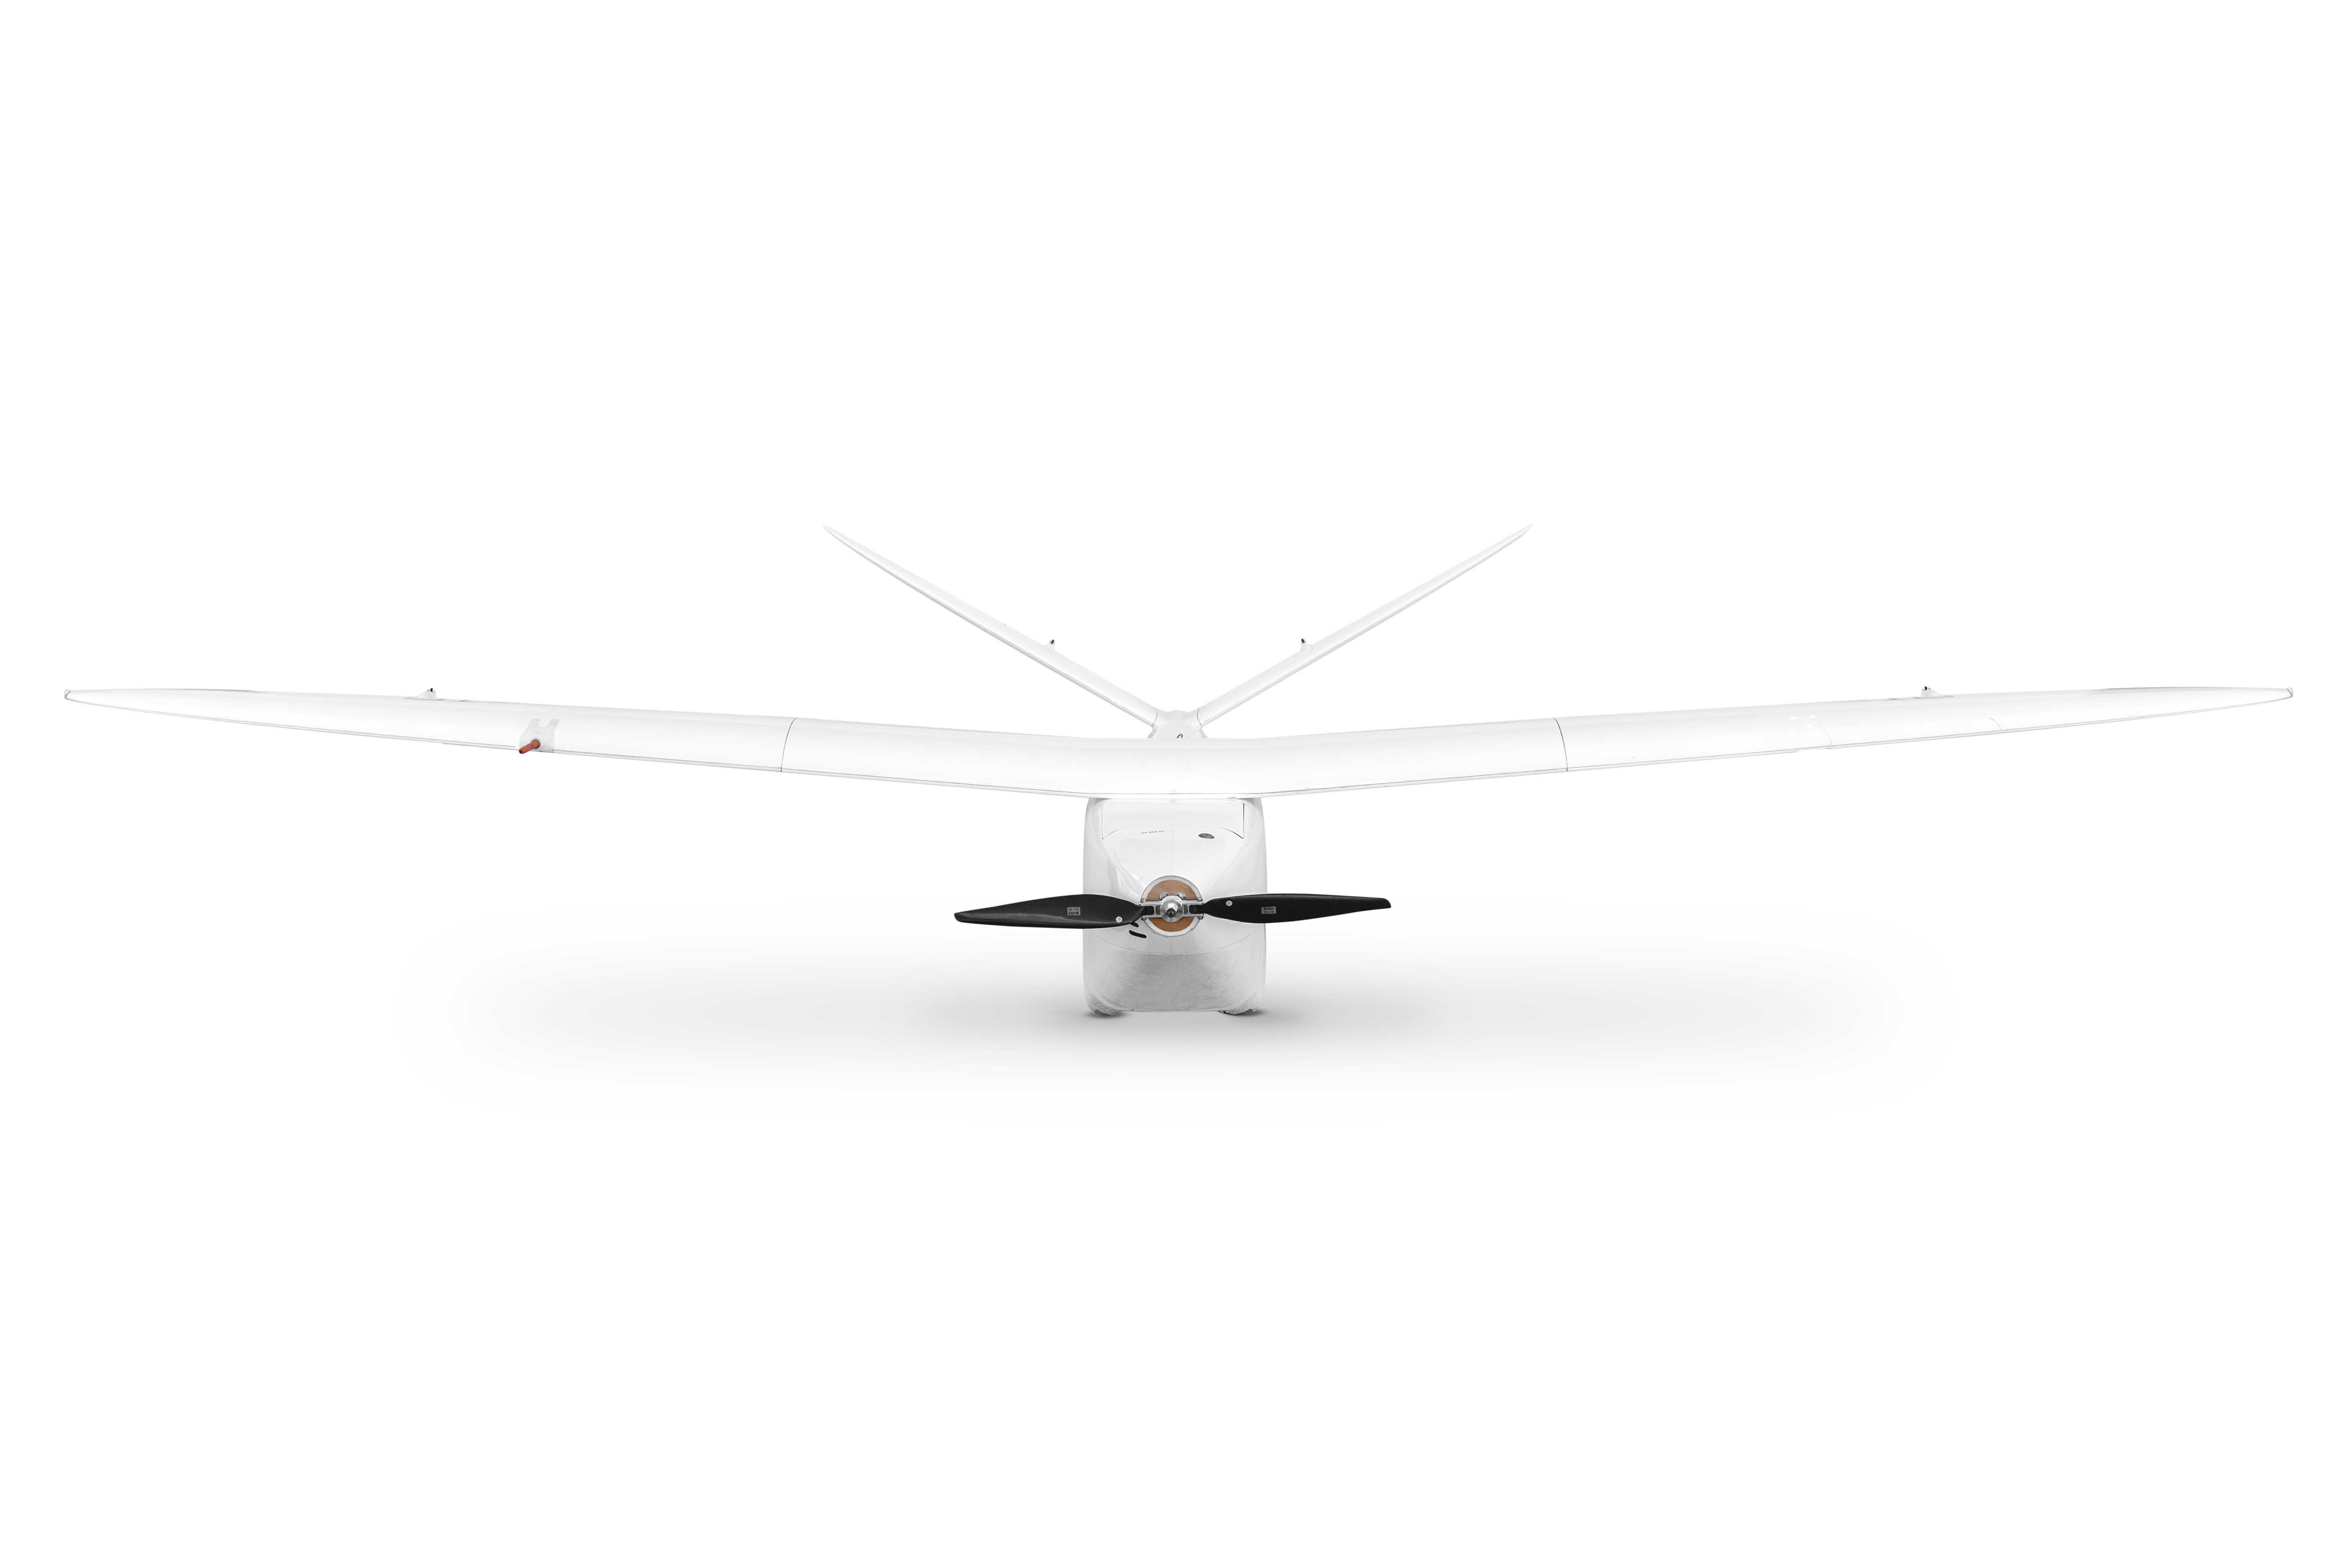 Delair-Tech military DT26M UAV